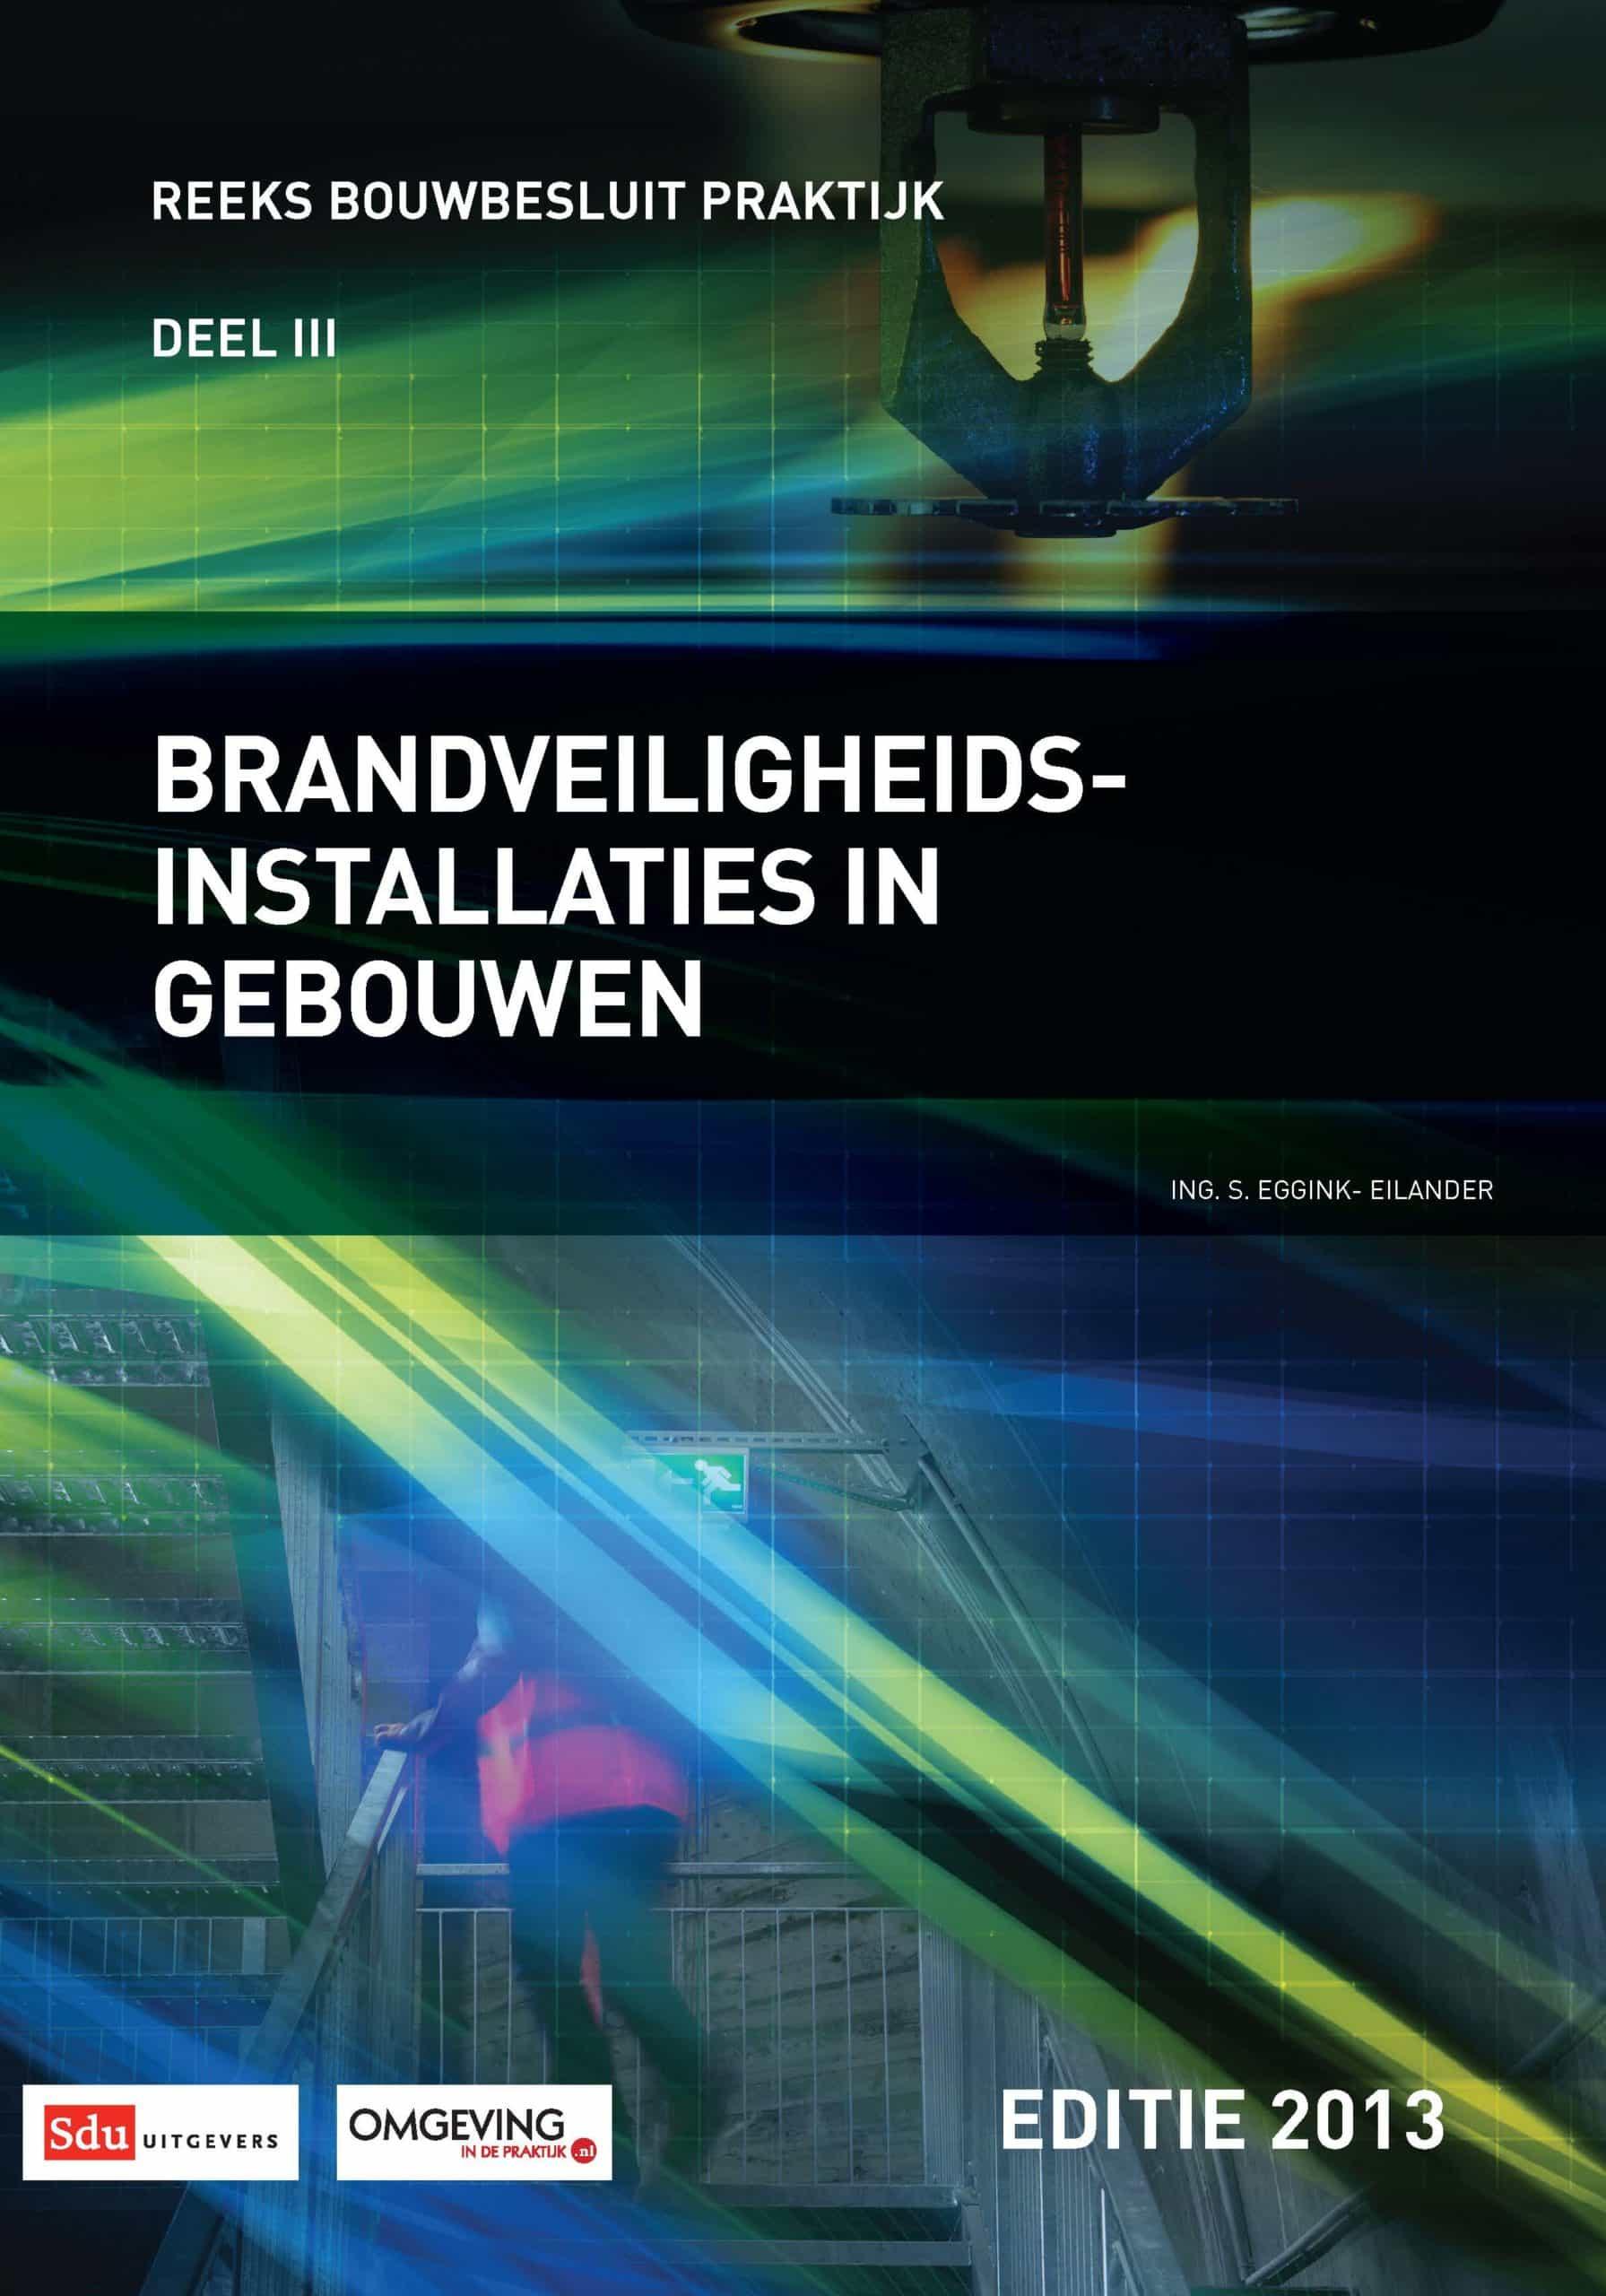 voorplat-Brandveiligheidinstallaties-in-gebouwen-B5-3-scaled